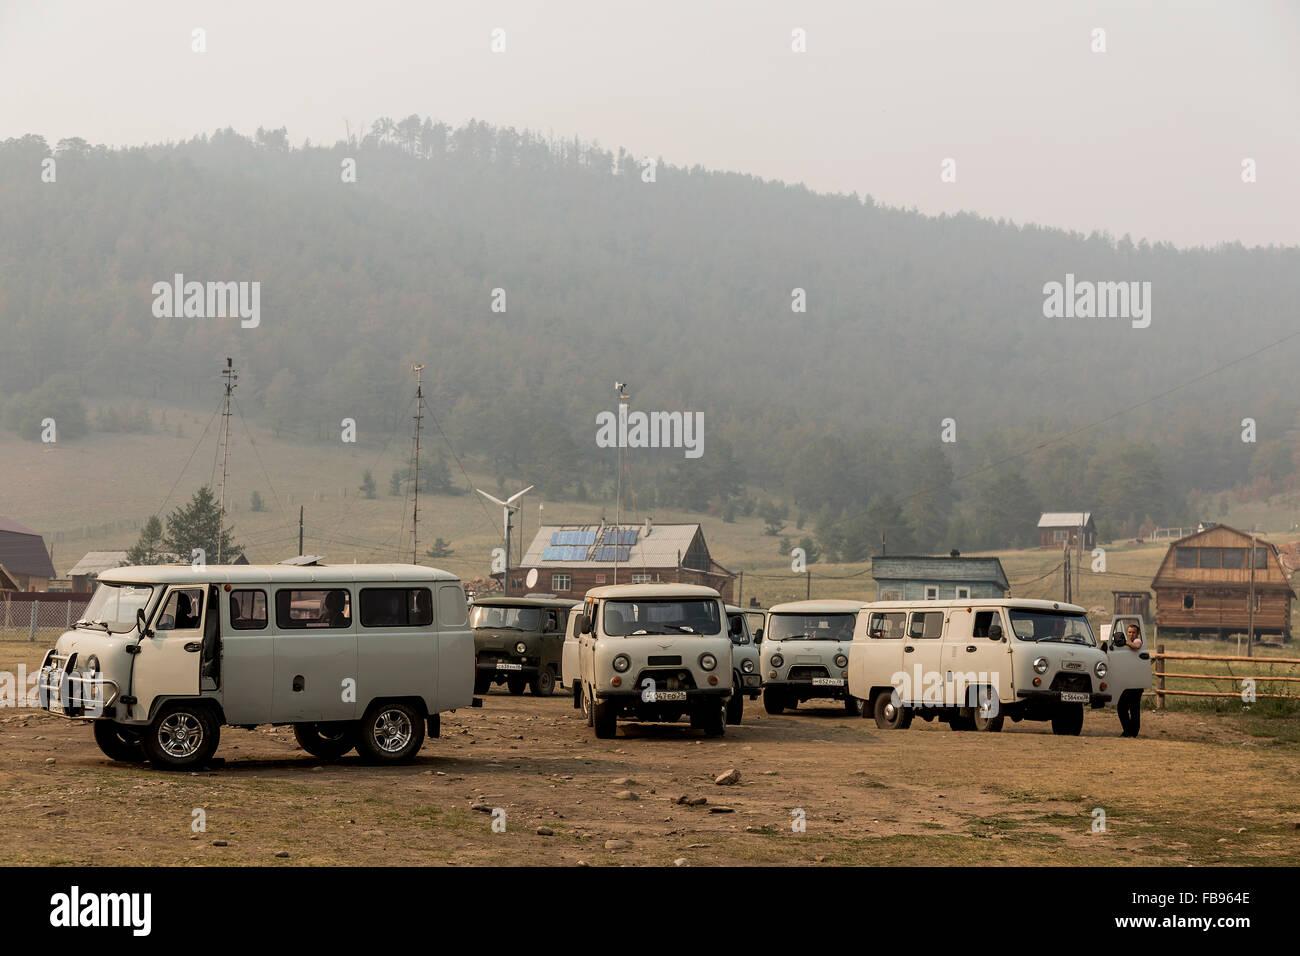 Russian Uaz vans in Olkhon Island in Lake Baikal, Russia - Stock Image